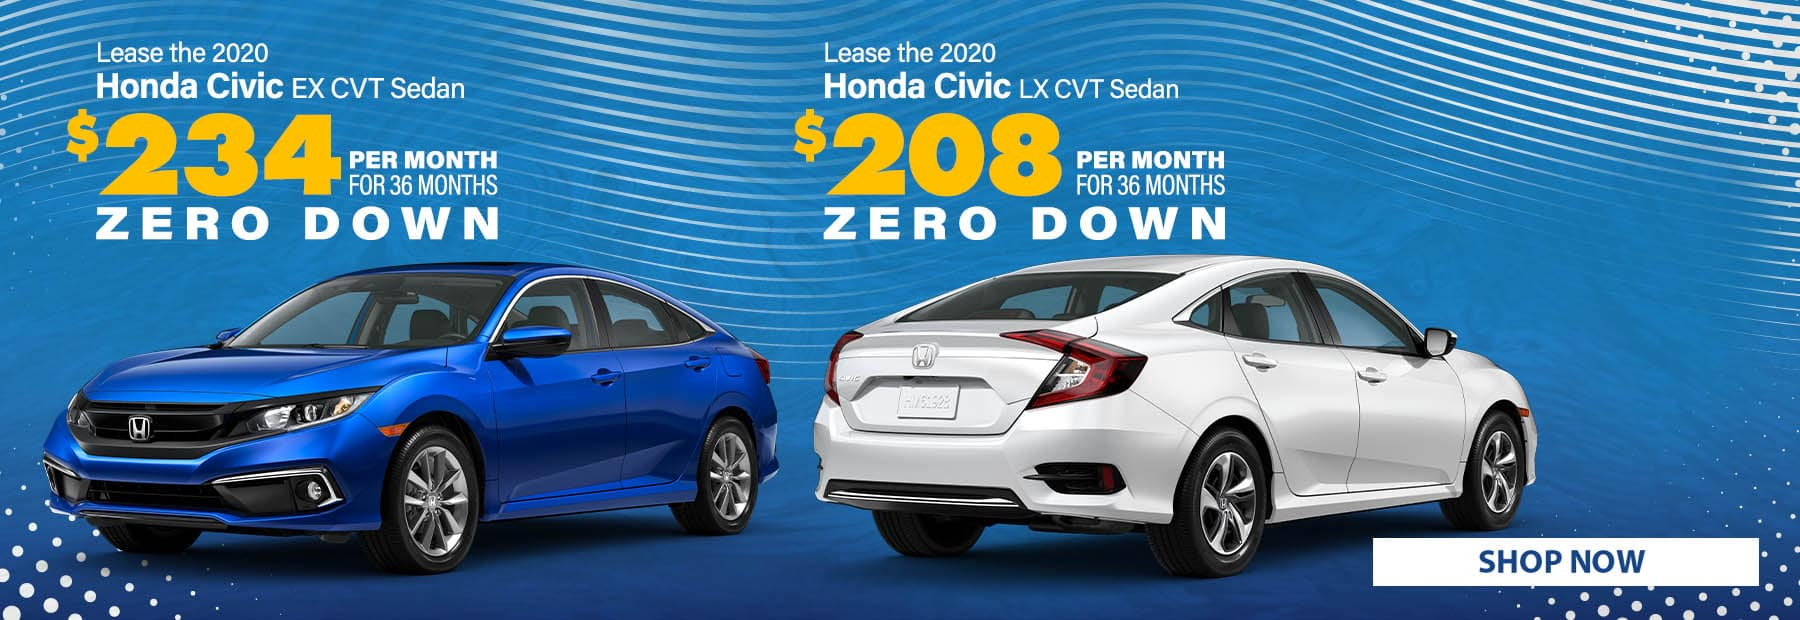 Lease a 2020 Honda Civic EX CVT Sedan for $234/mo. for 36 months with $0 down or Lease a 2020 Honda Civic LX CVT Sedan for $208/mo. for 36 months with $0 down